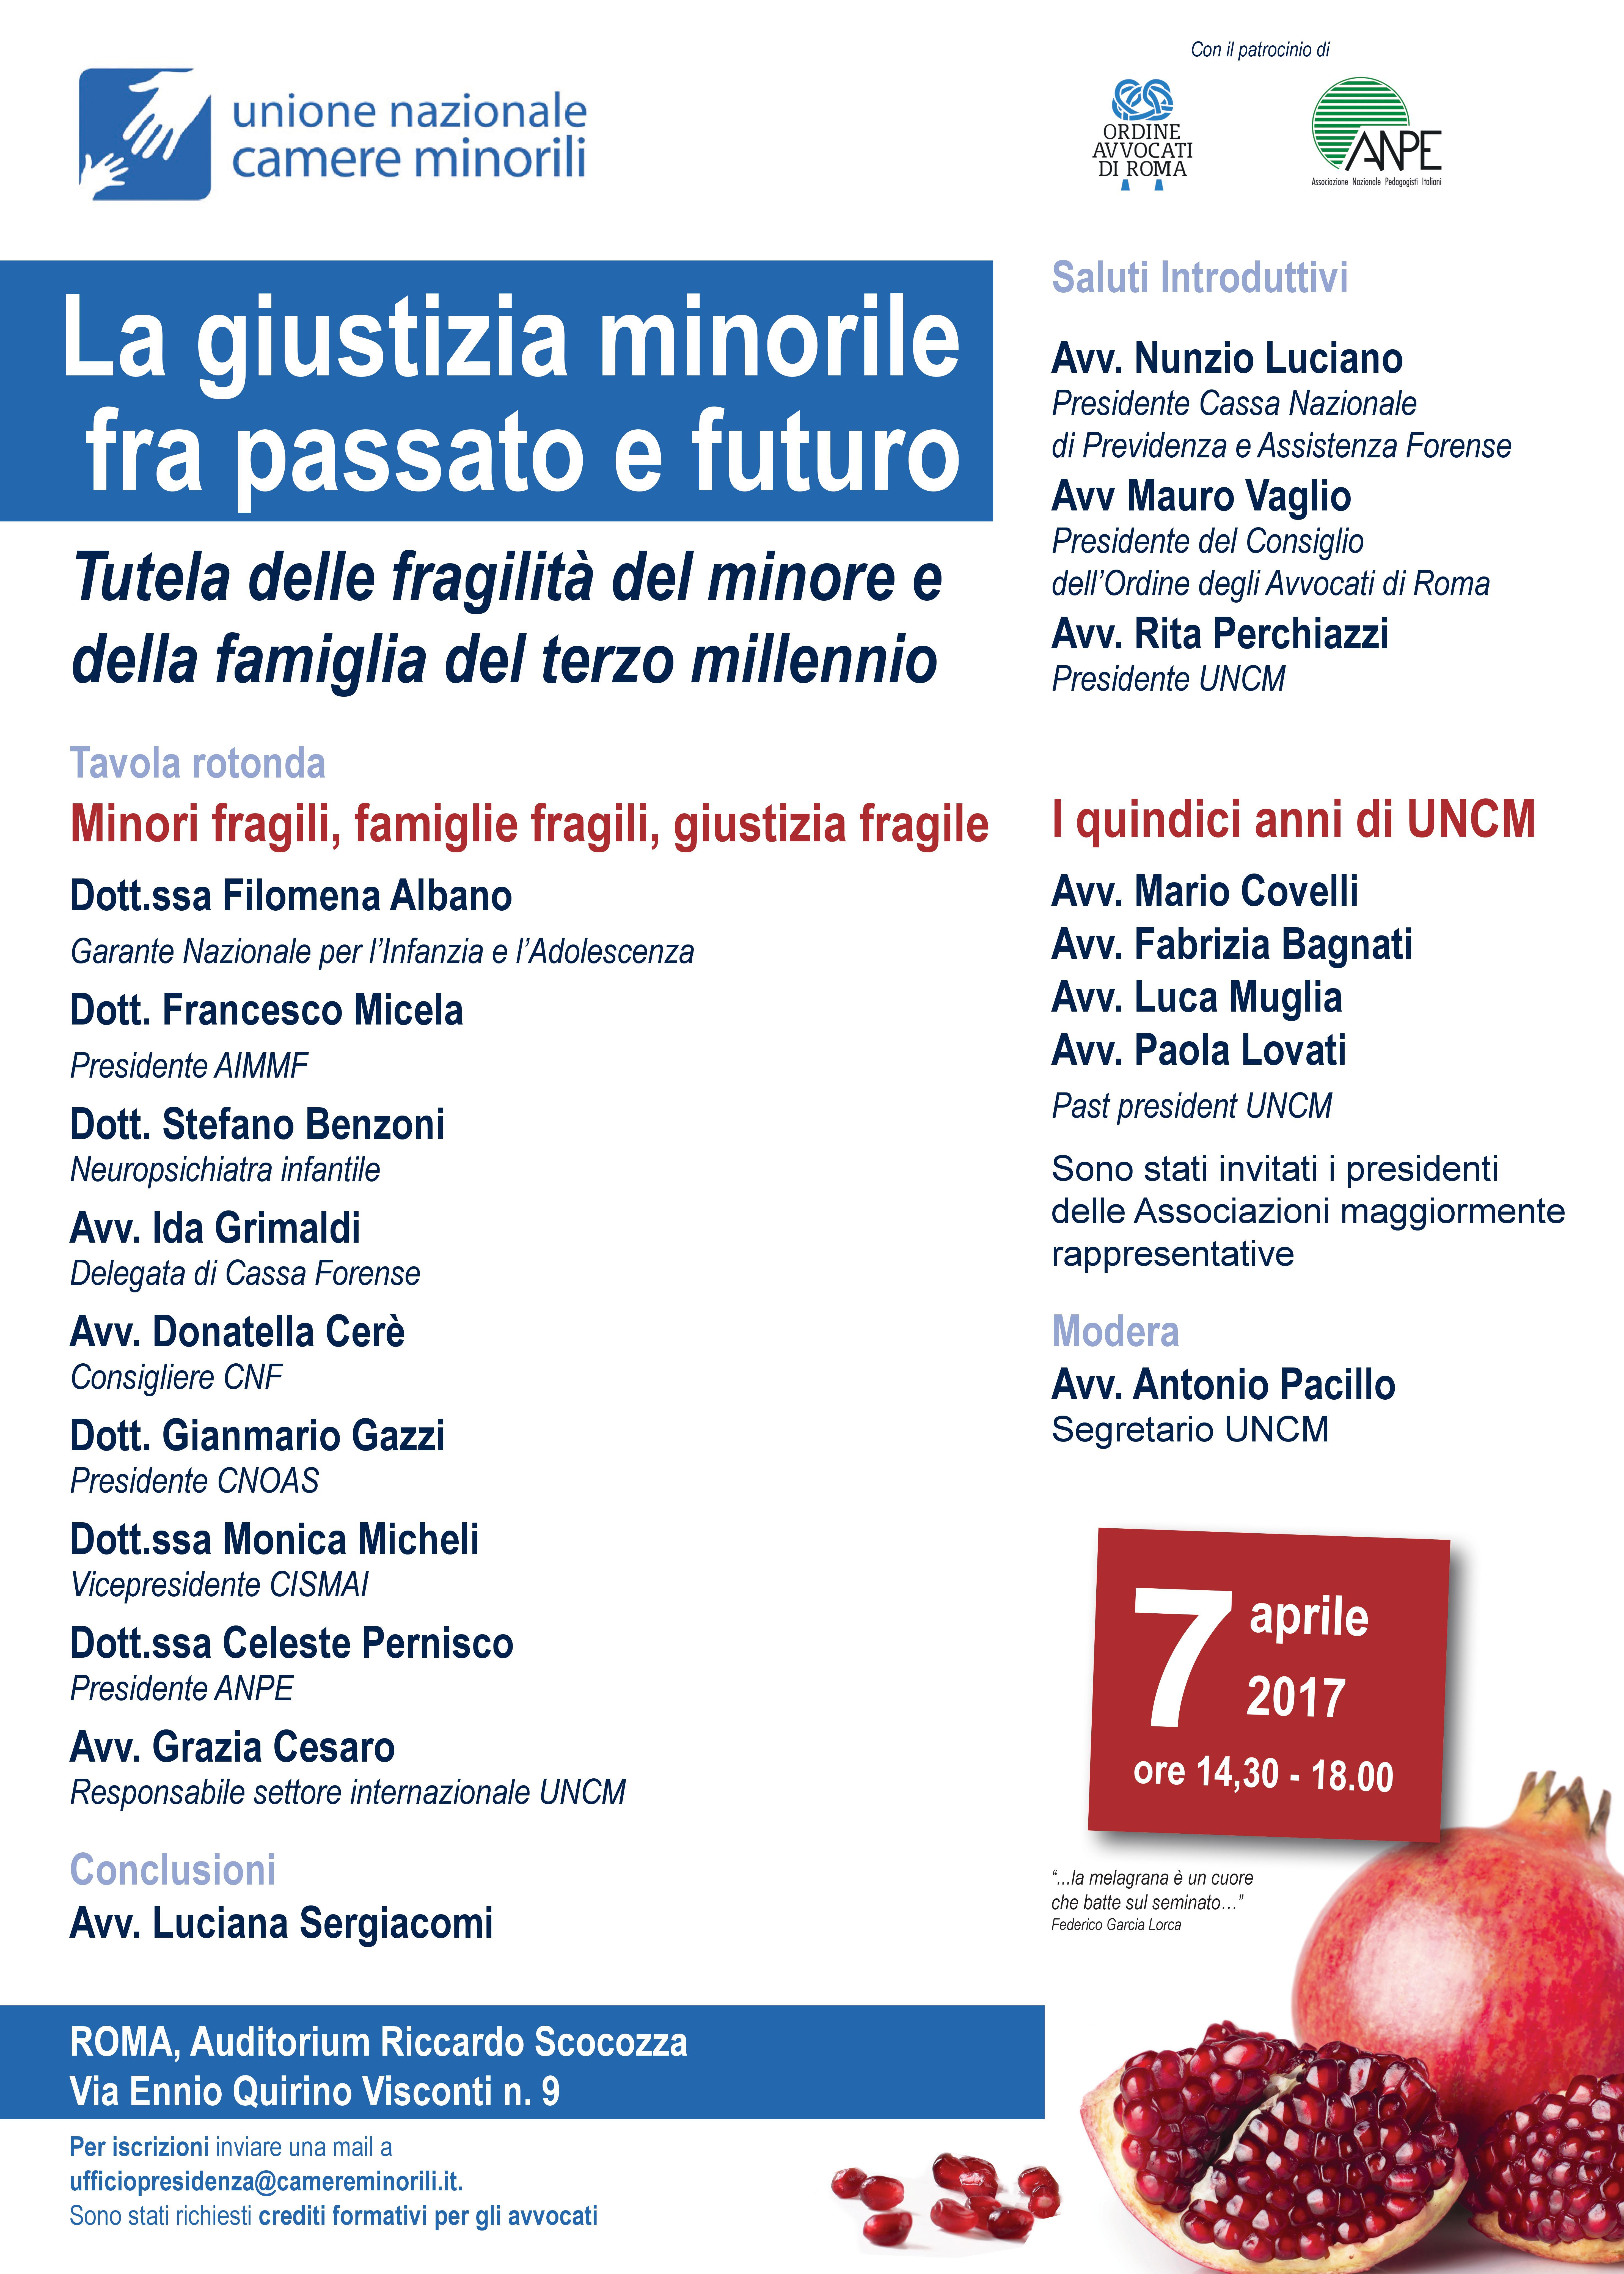 Camere Minorili_Roma 7.04.17